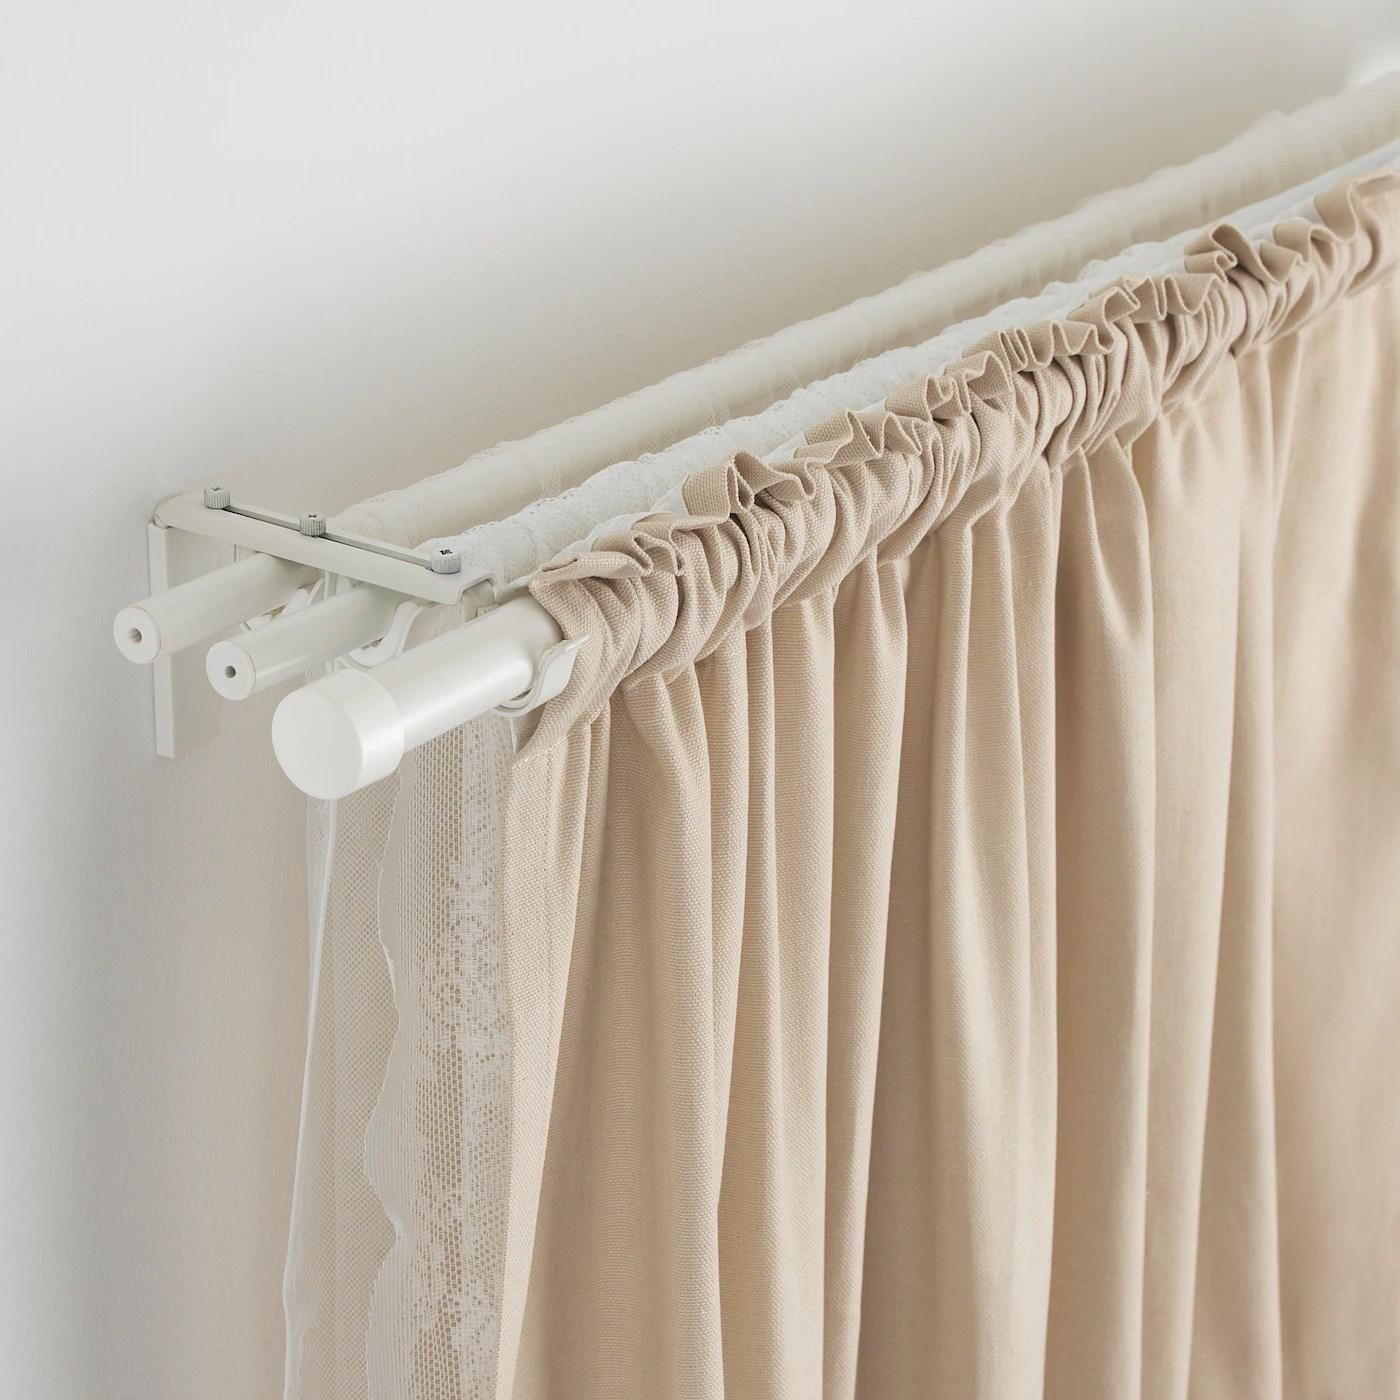 racka hugad triple curtain rod combination white 120 210 cm